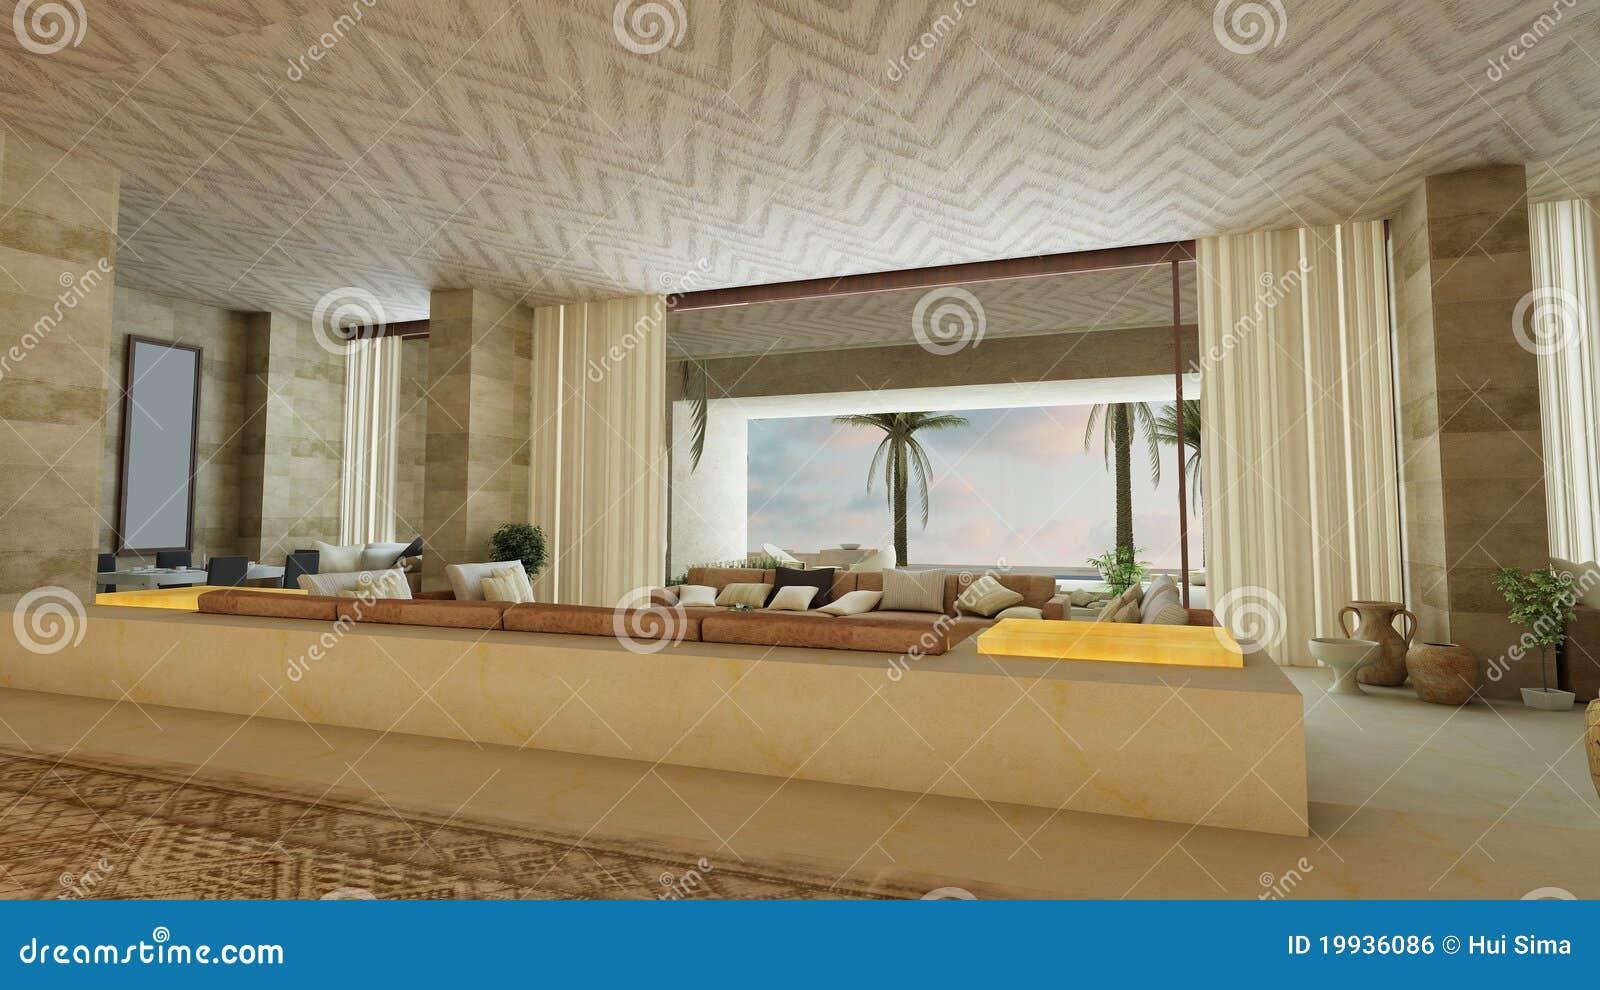 Sala de estar de lujo del estilo rabe imagen de archivo for Sala de estar estilo arabe